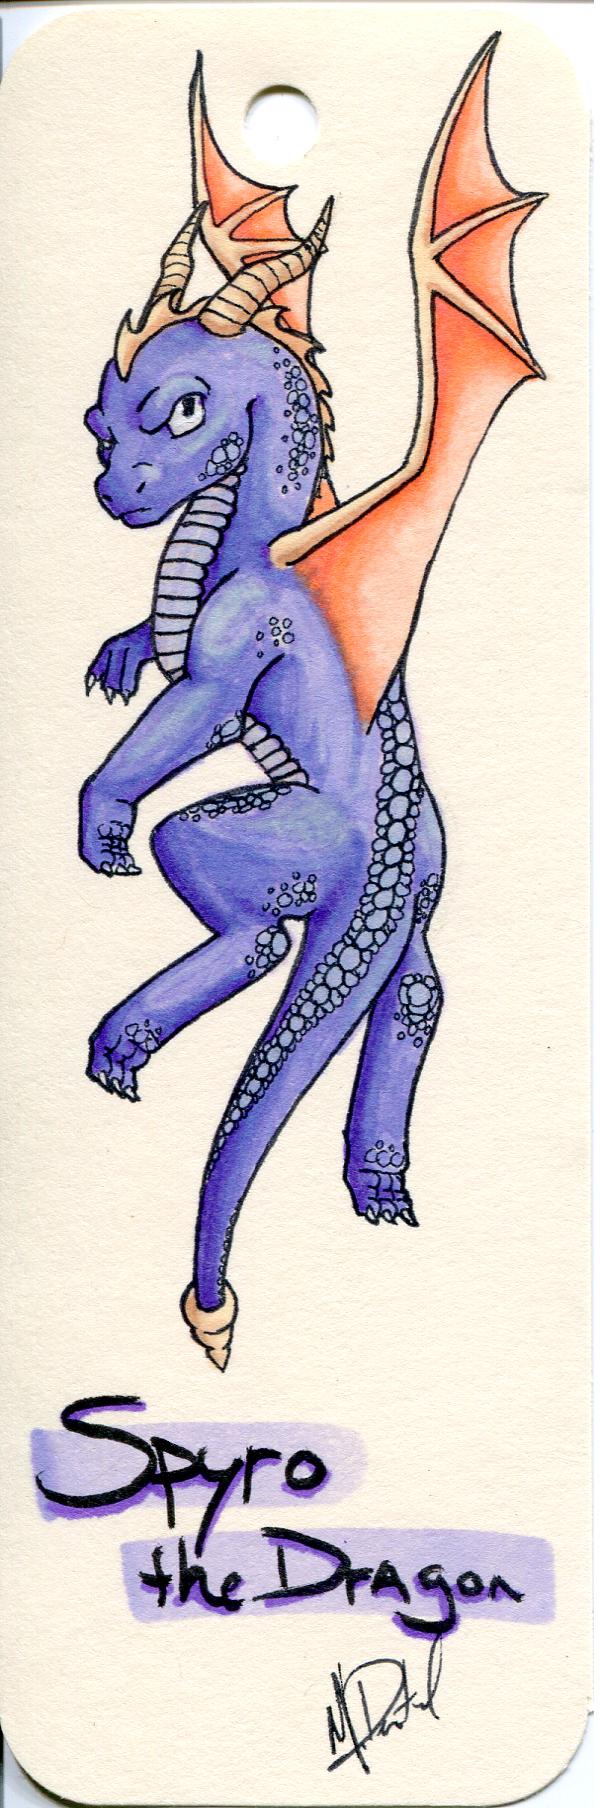 Most recent image: Bookmark Spyro